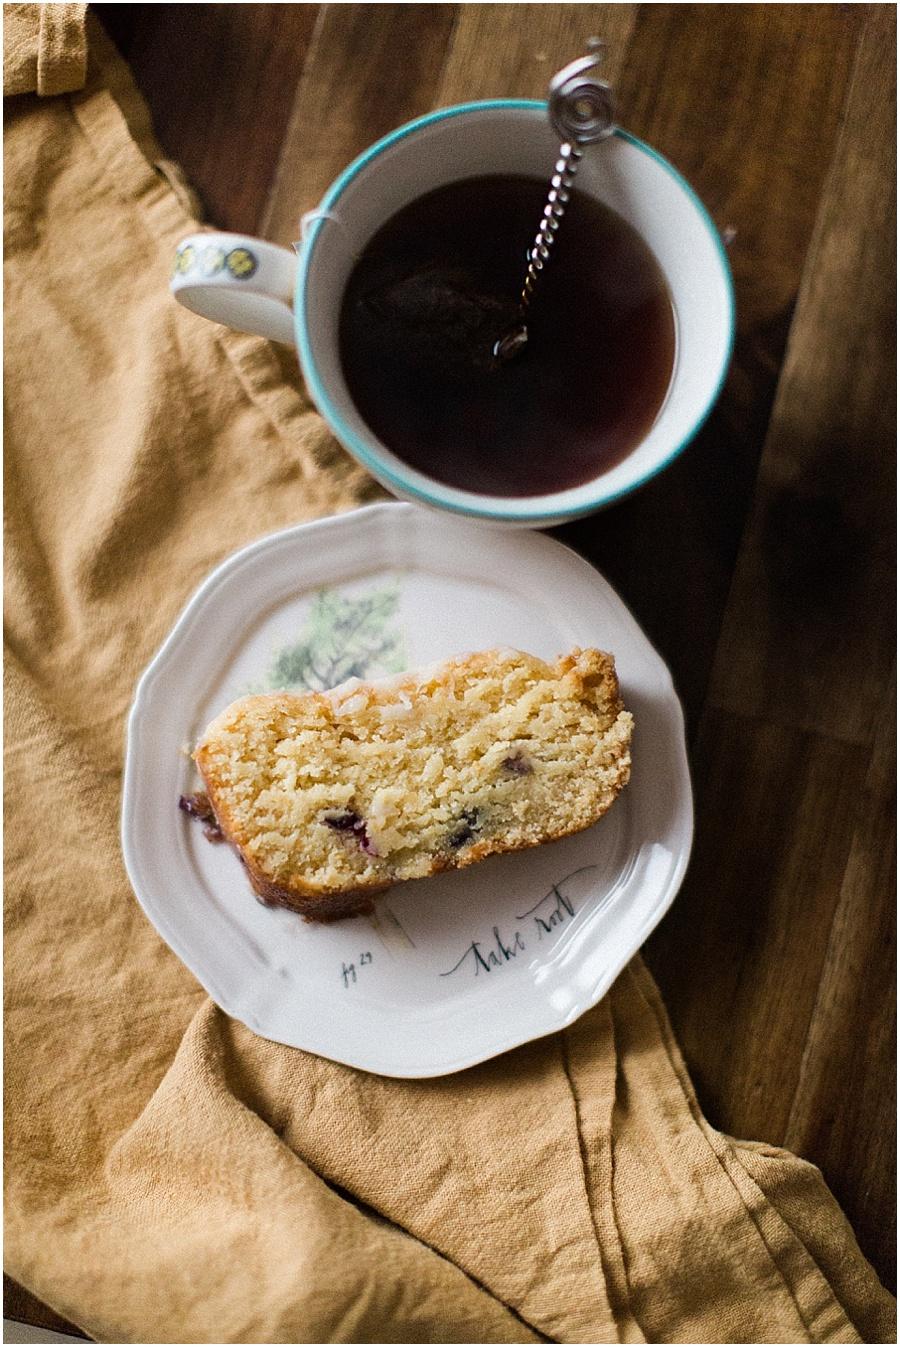 quaint-and-whim-baking-honey-lavender-4959.jpg